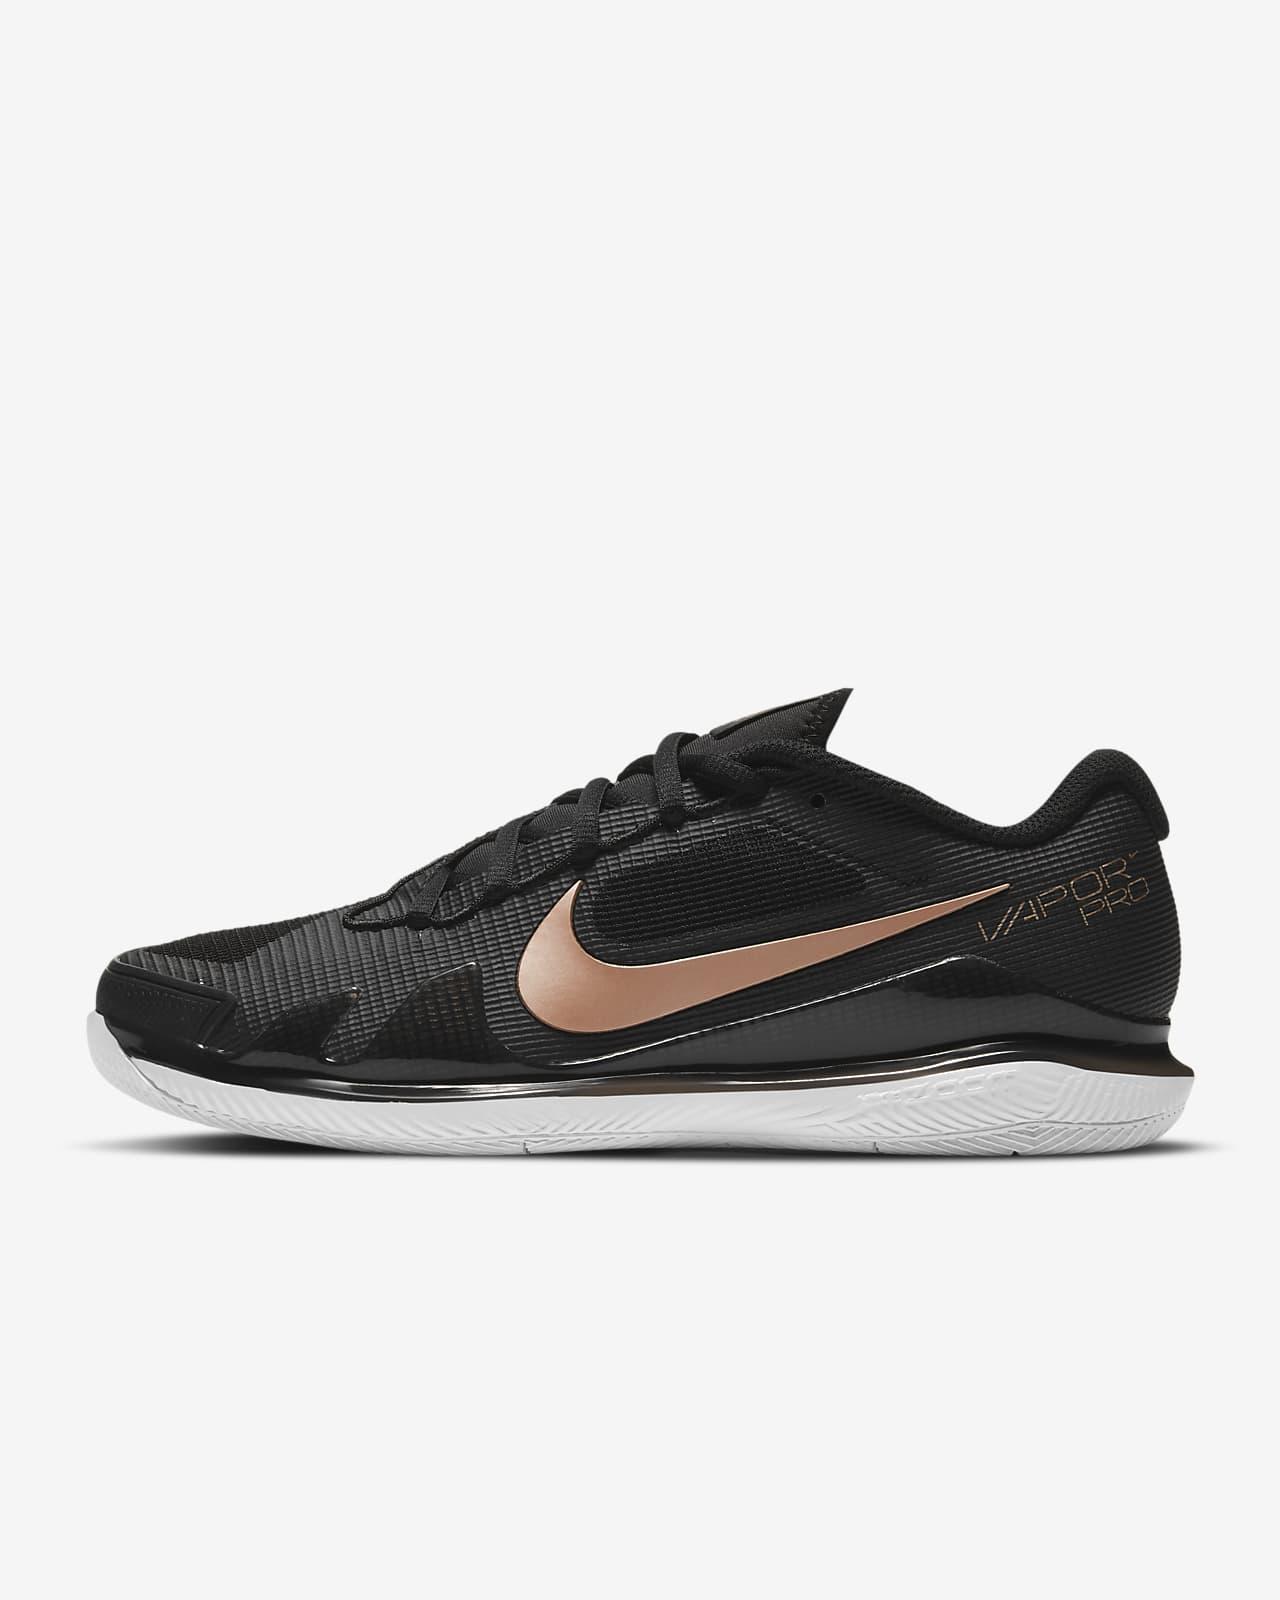 NikeCourt Air Zoom Vapor Pro Women's Hard Court Tennis Shoes. Nike.com